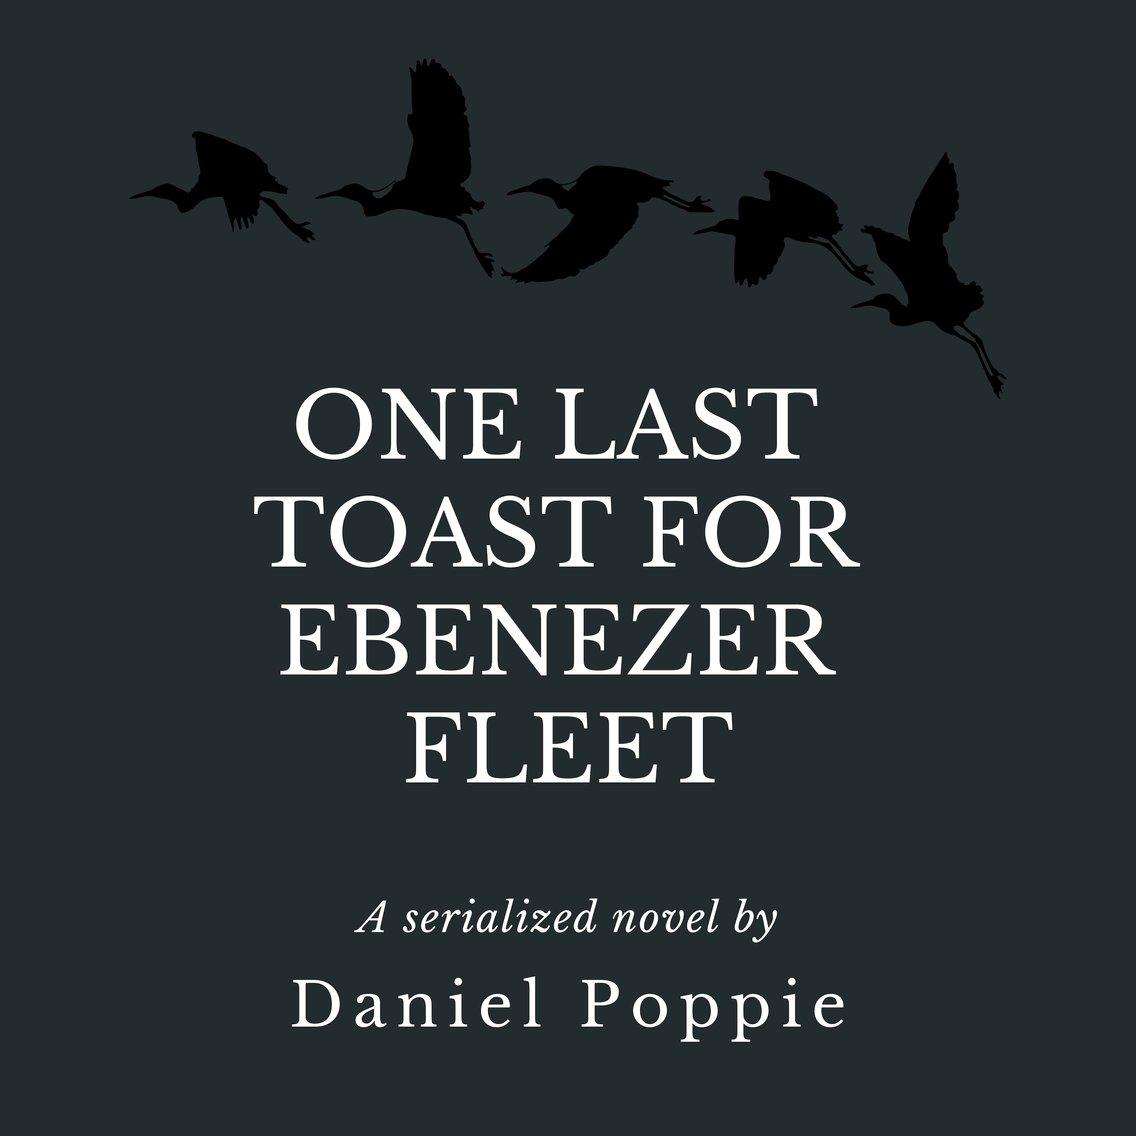 One Last Toast for Ebenezer Fleet - immagine di copertina